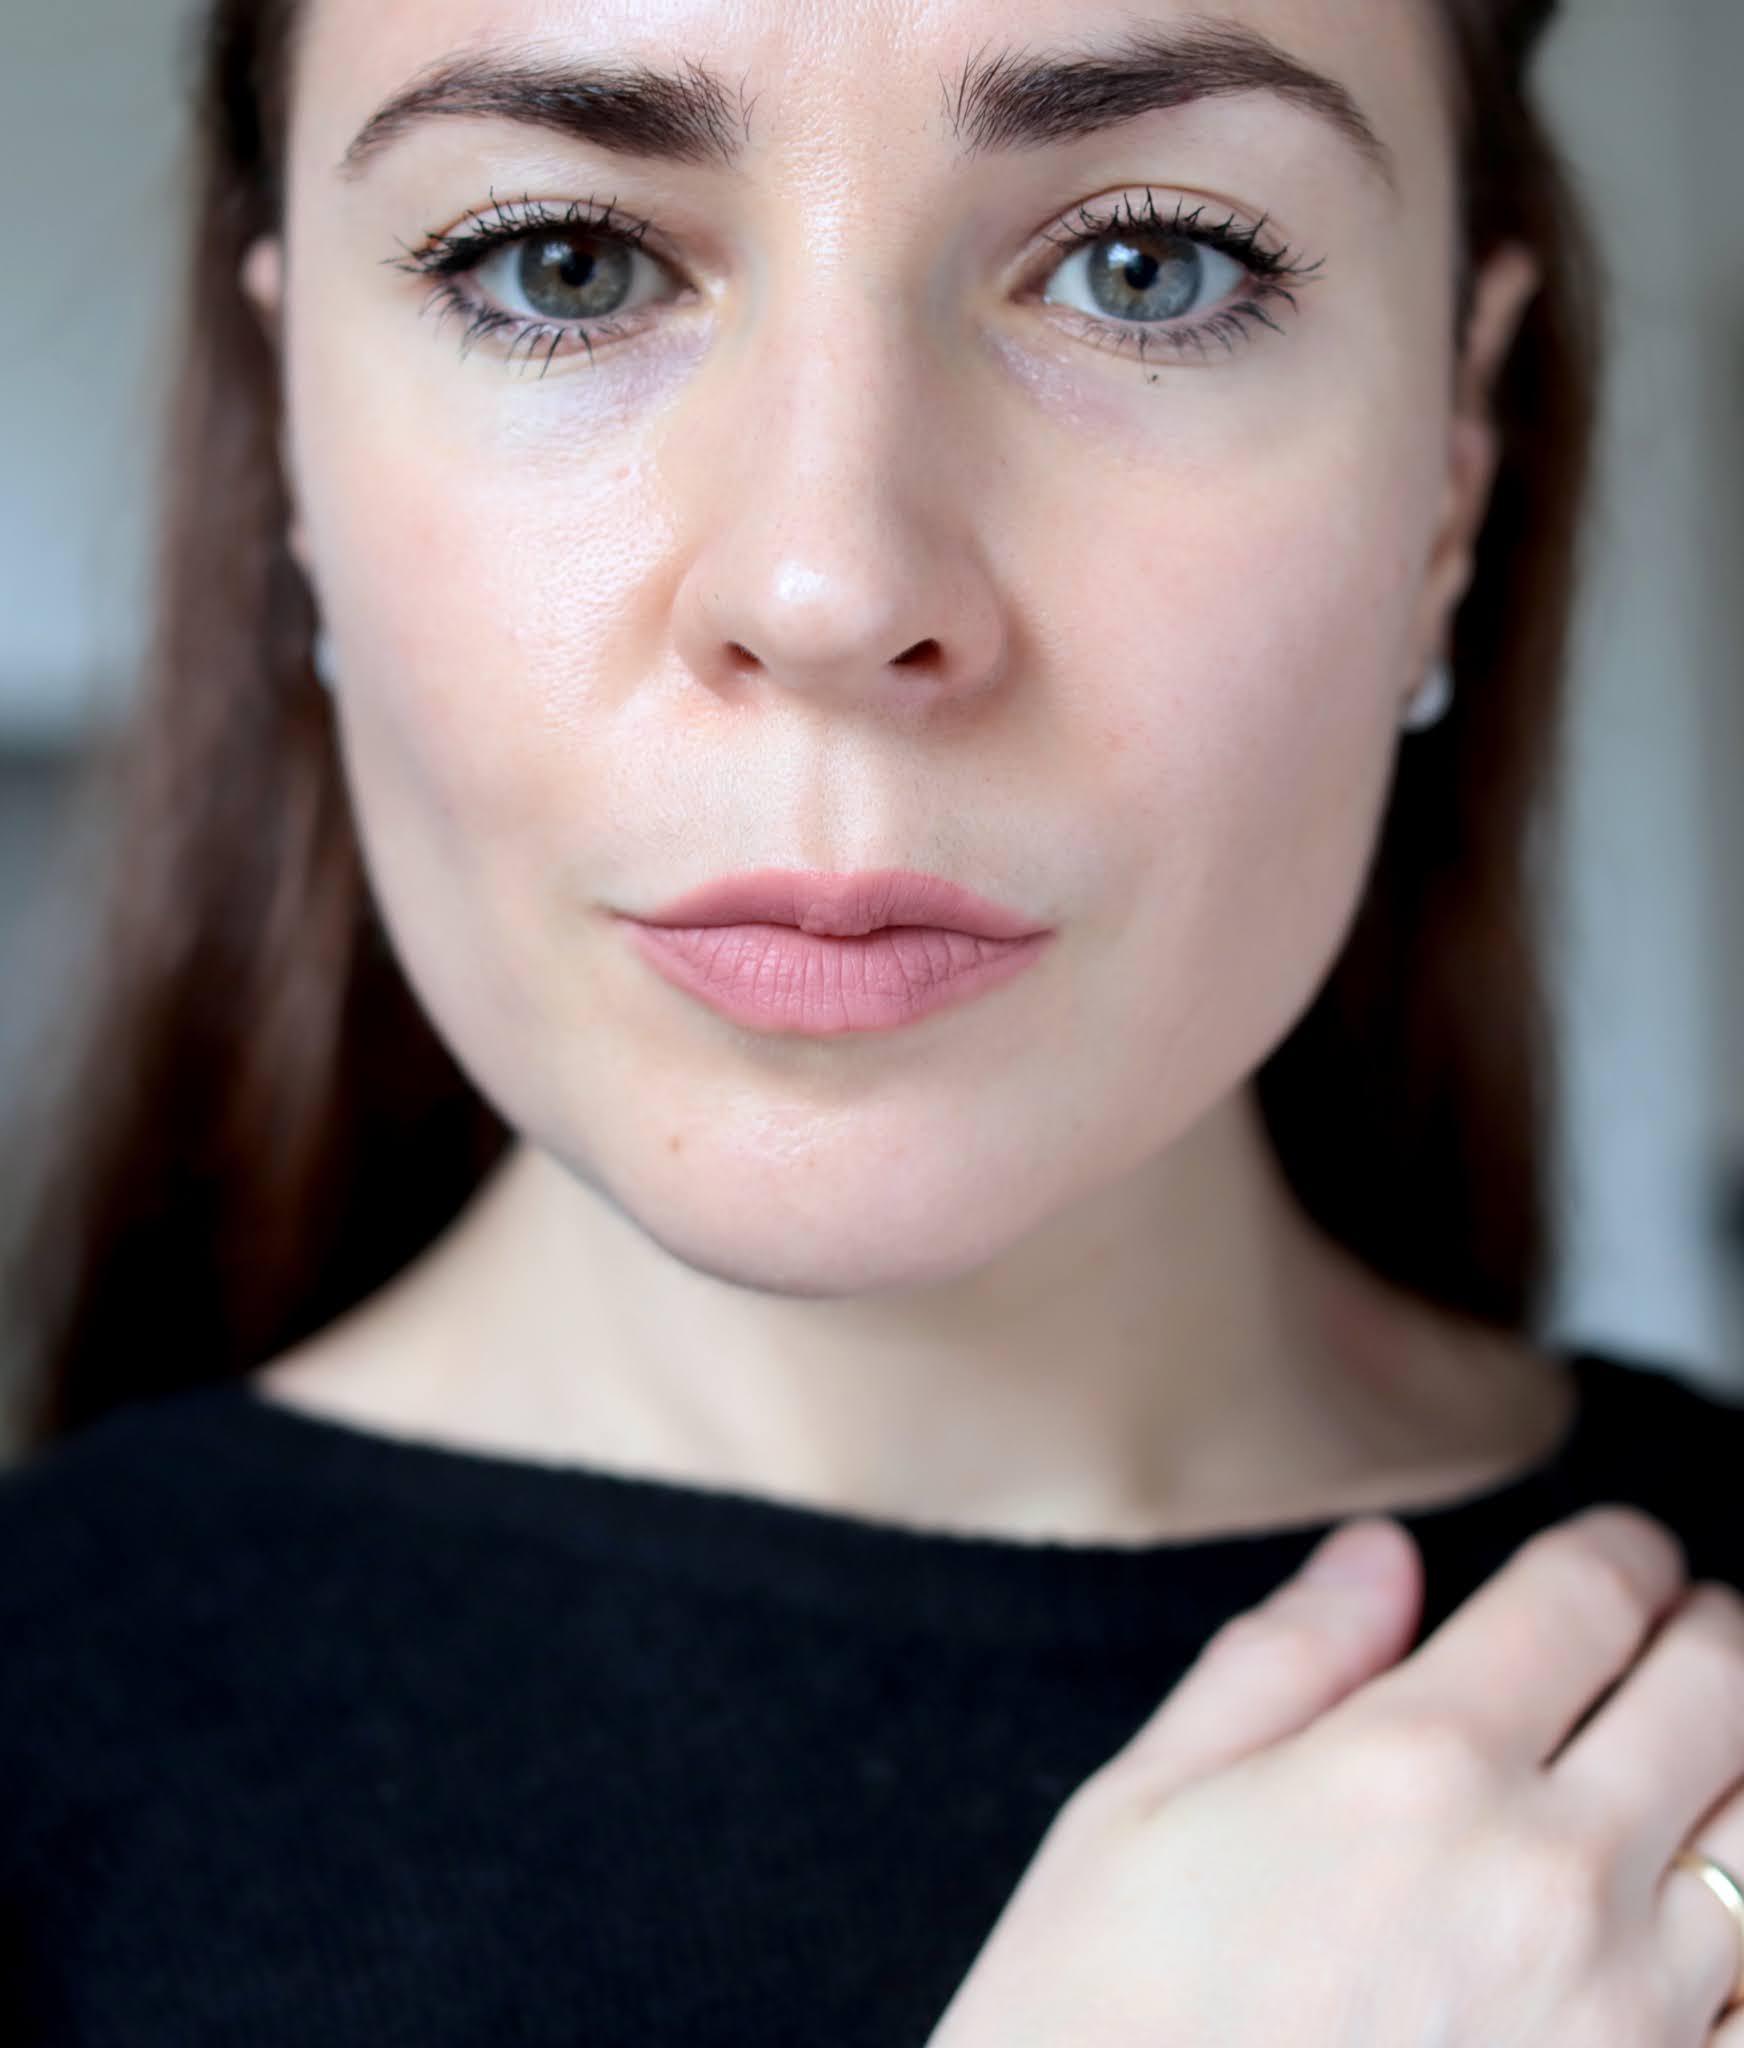 Ilia Super Serum Skin Tint Fond de Teint avis